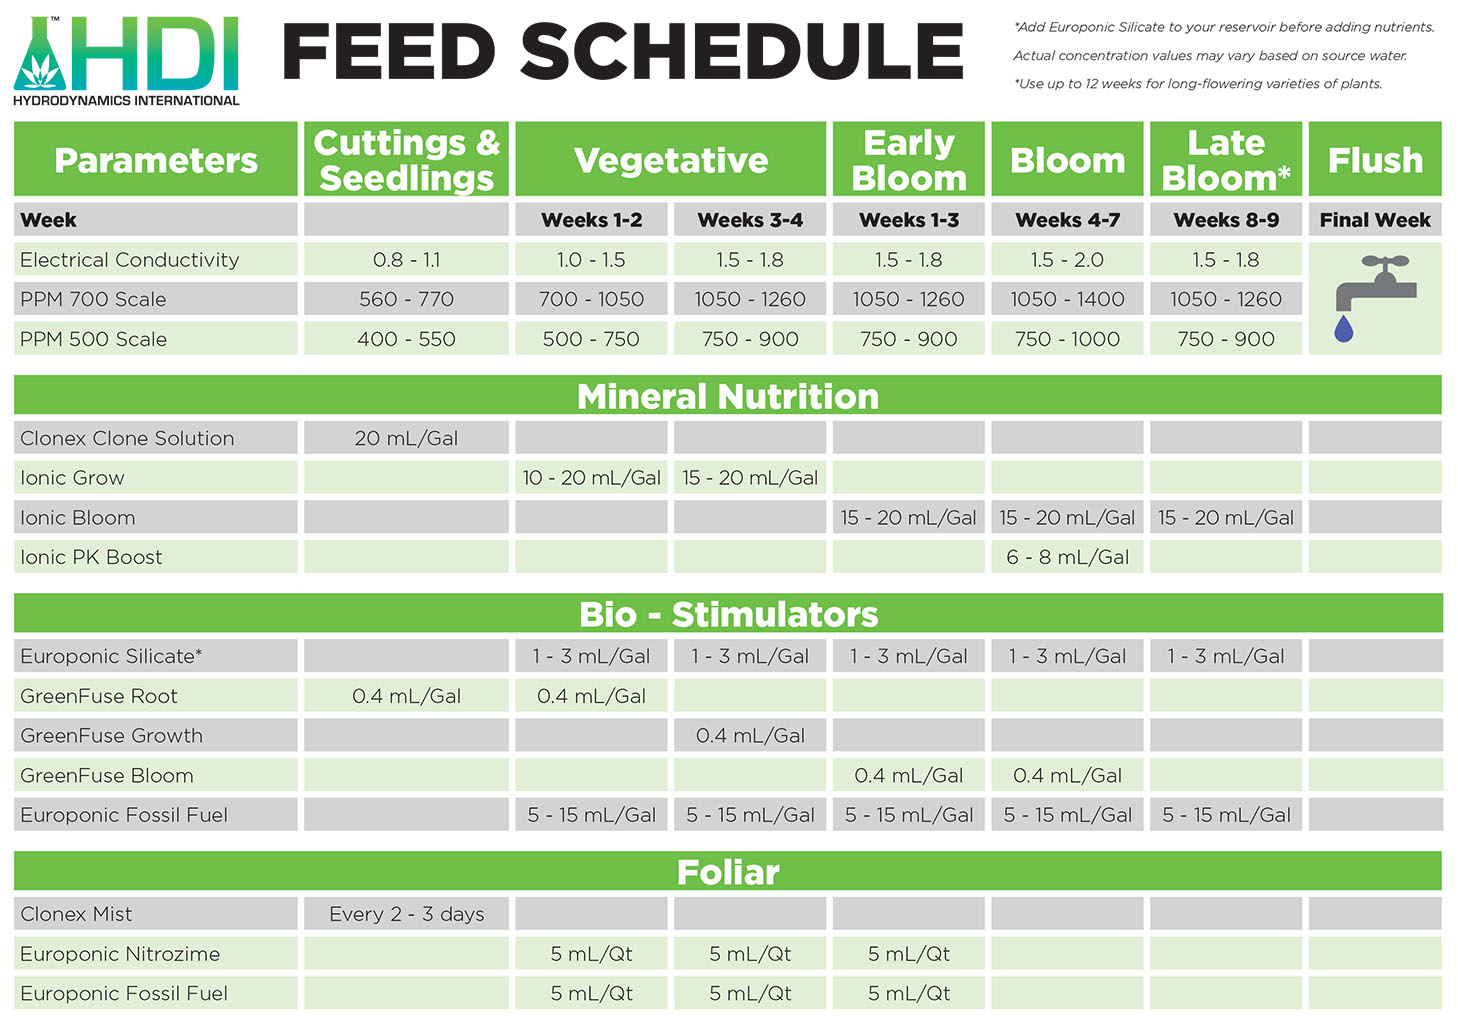 Hydrodynamics International | Nutrients for Hydroponics and Soil | HDI